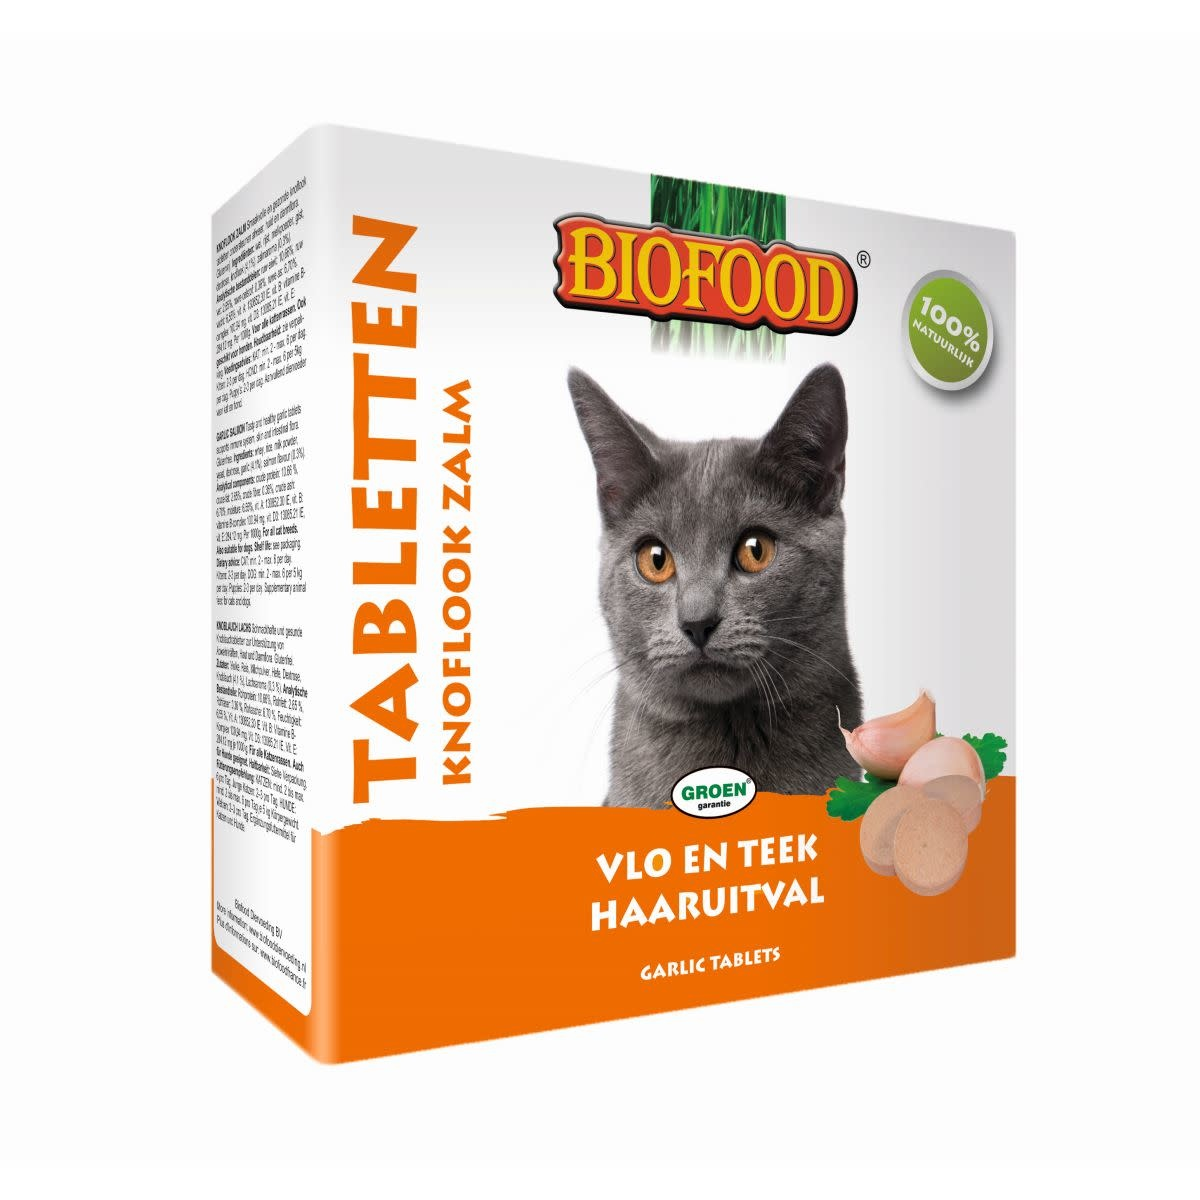 BioFood Biofood knoflook/zalm tabletten